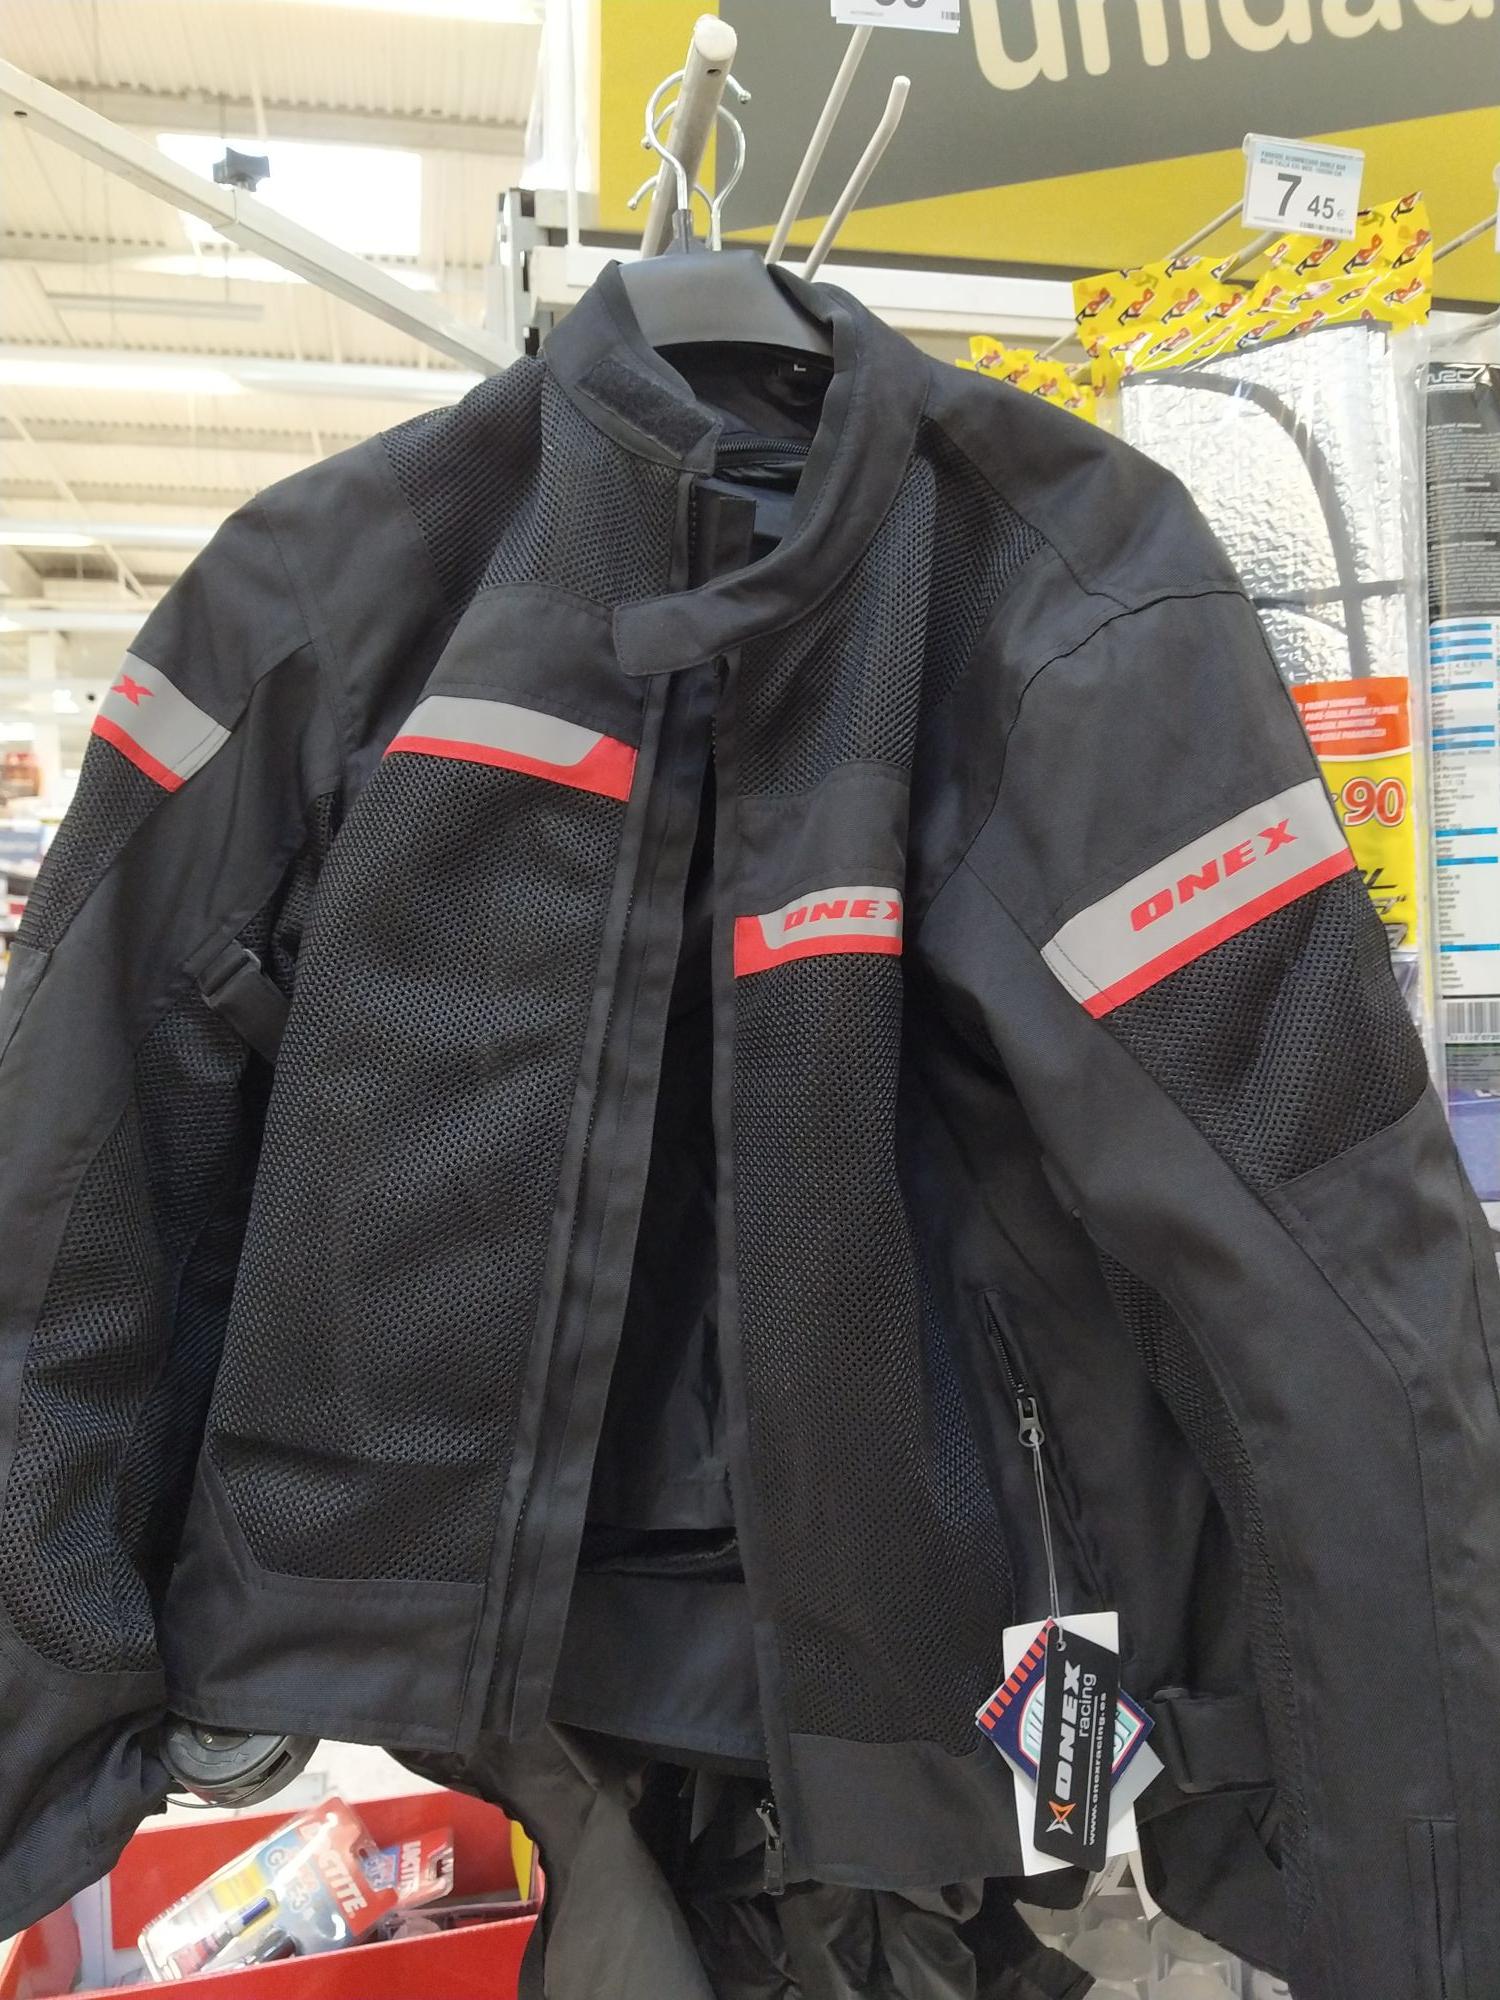 Chaqueta moto verano (Carrefour)